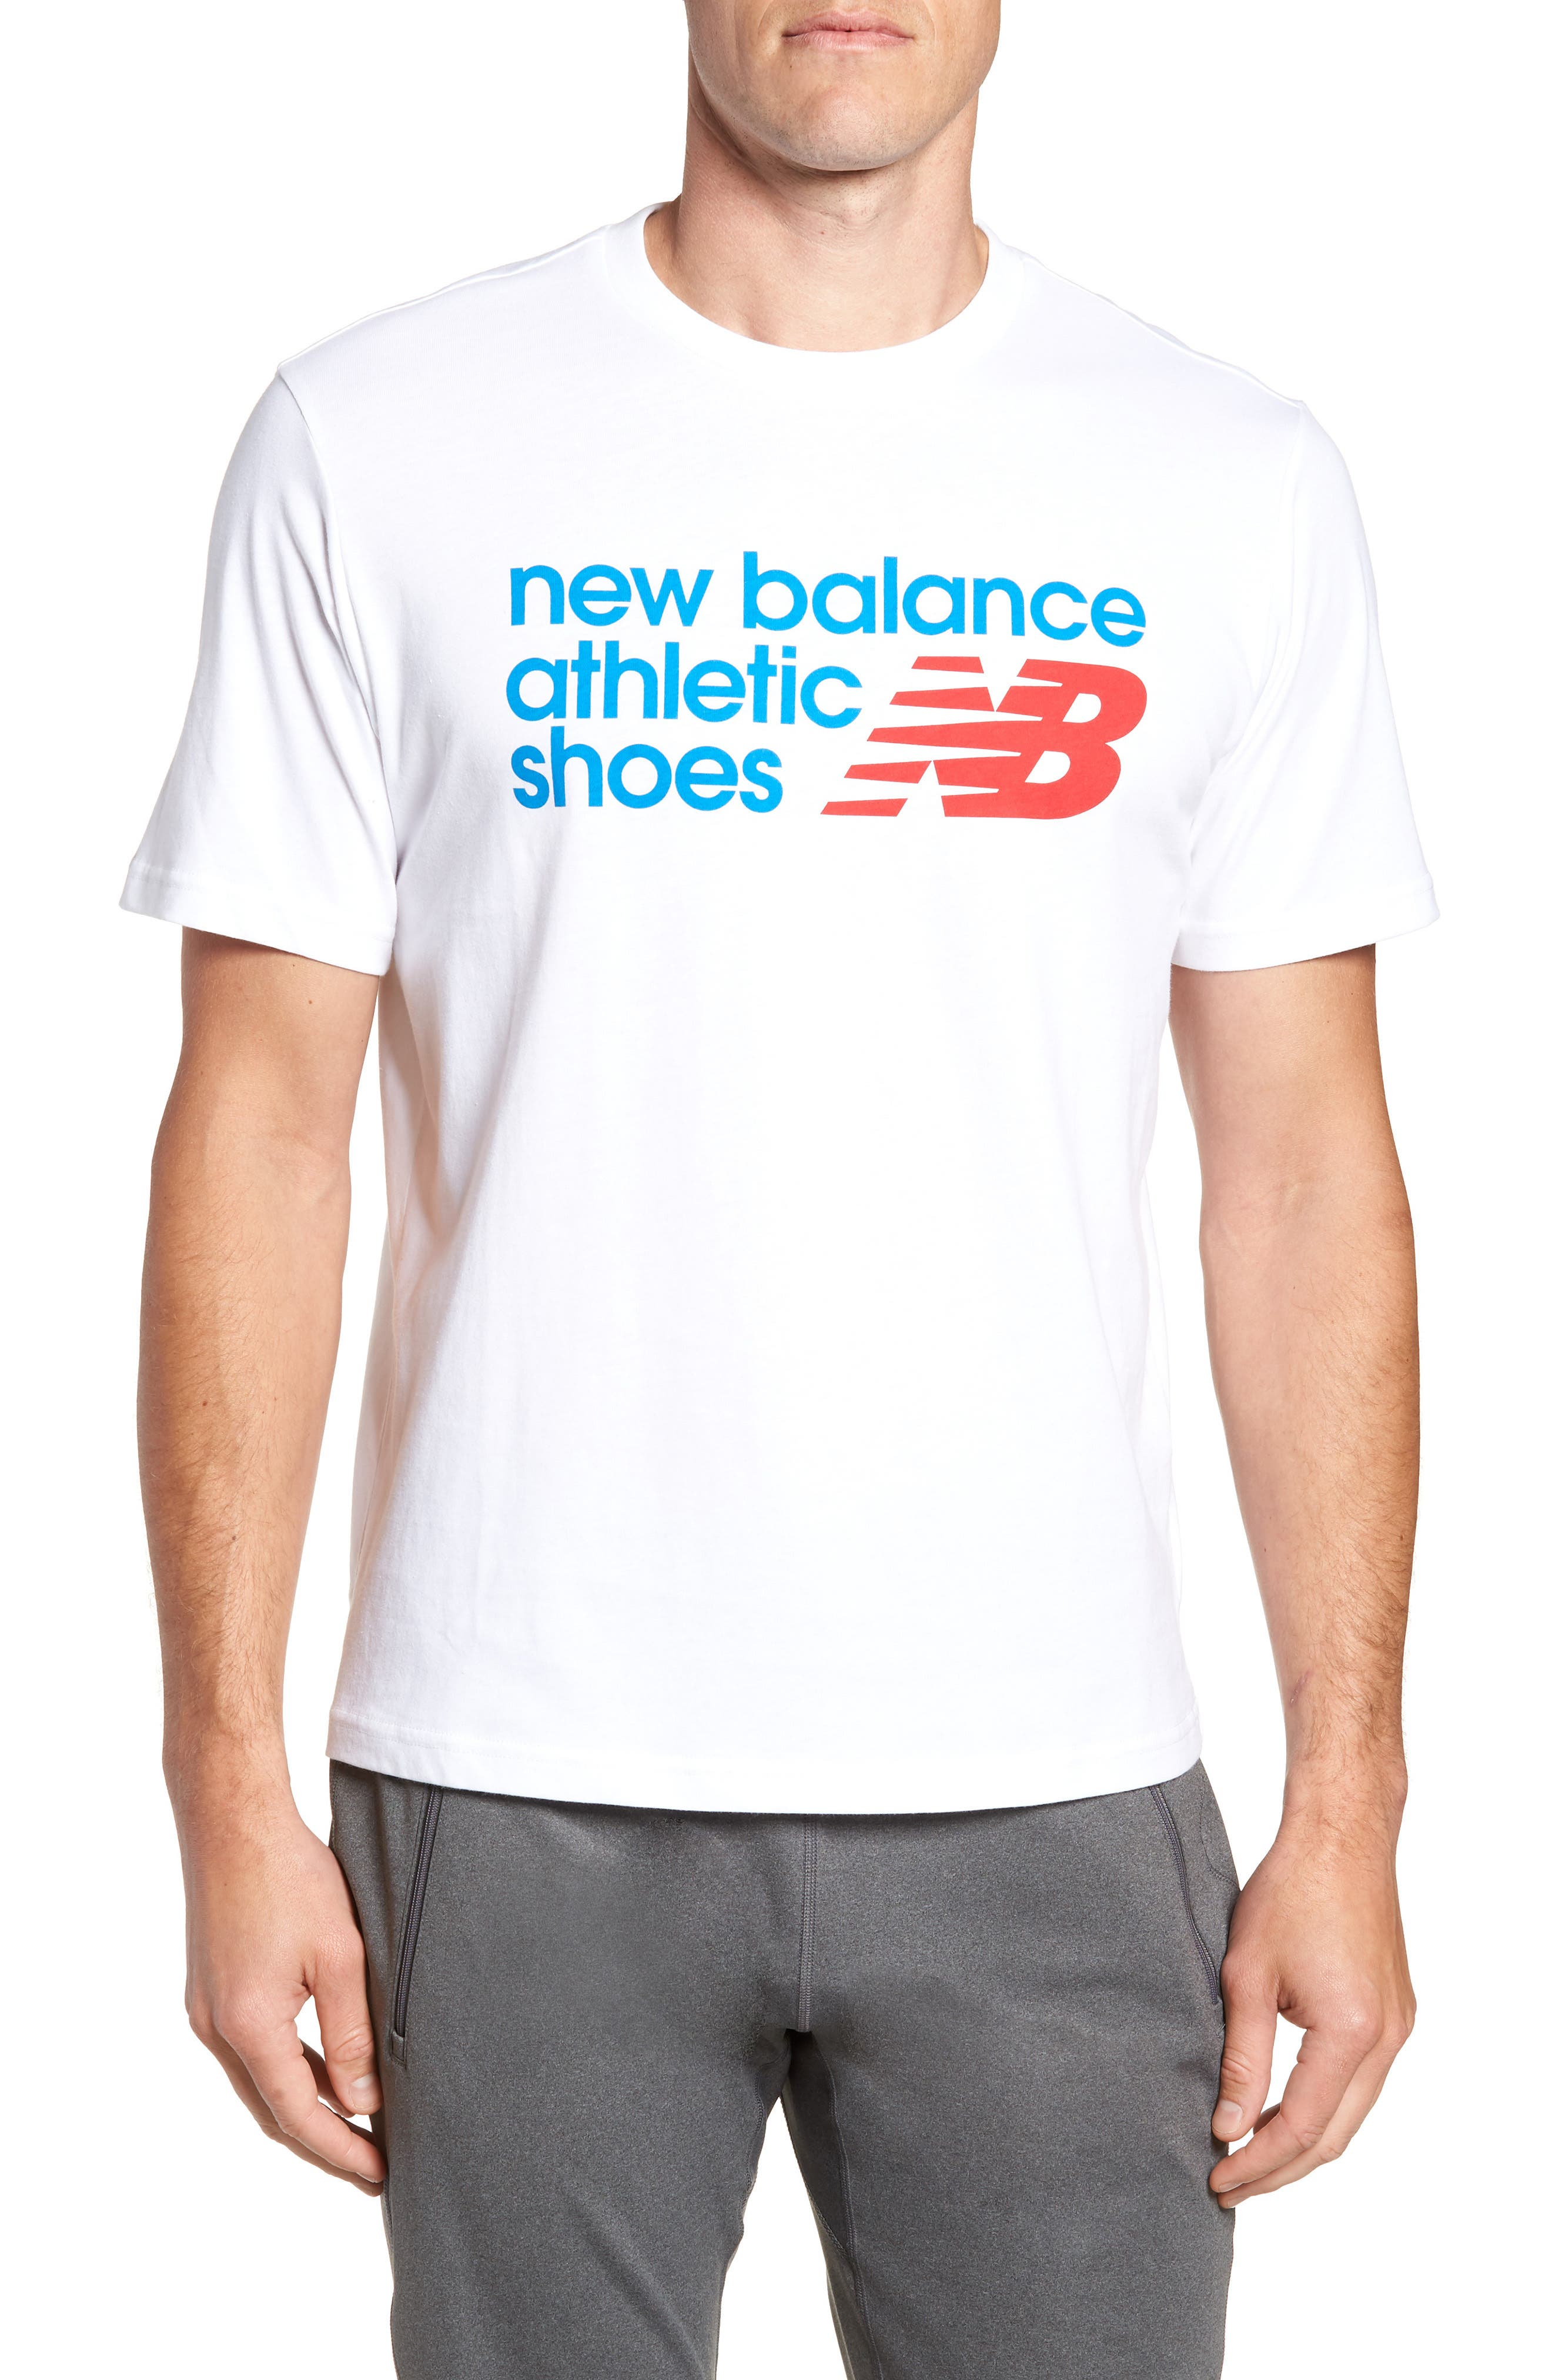 New Balance Nb Shoe Box Graphic T-Shirt, White